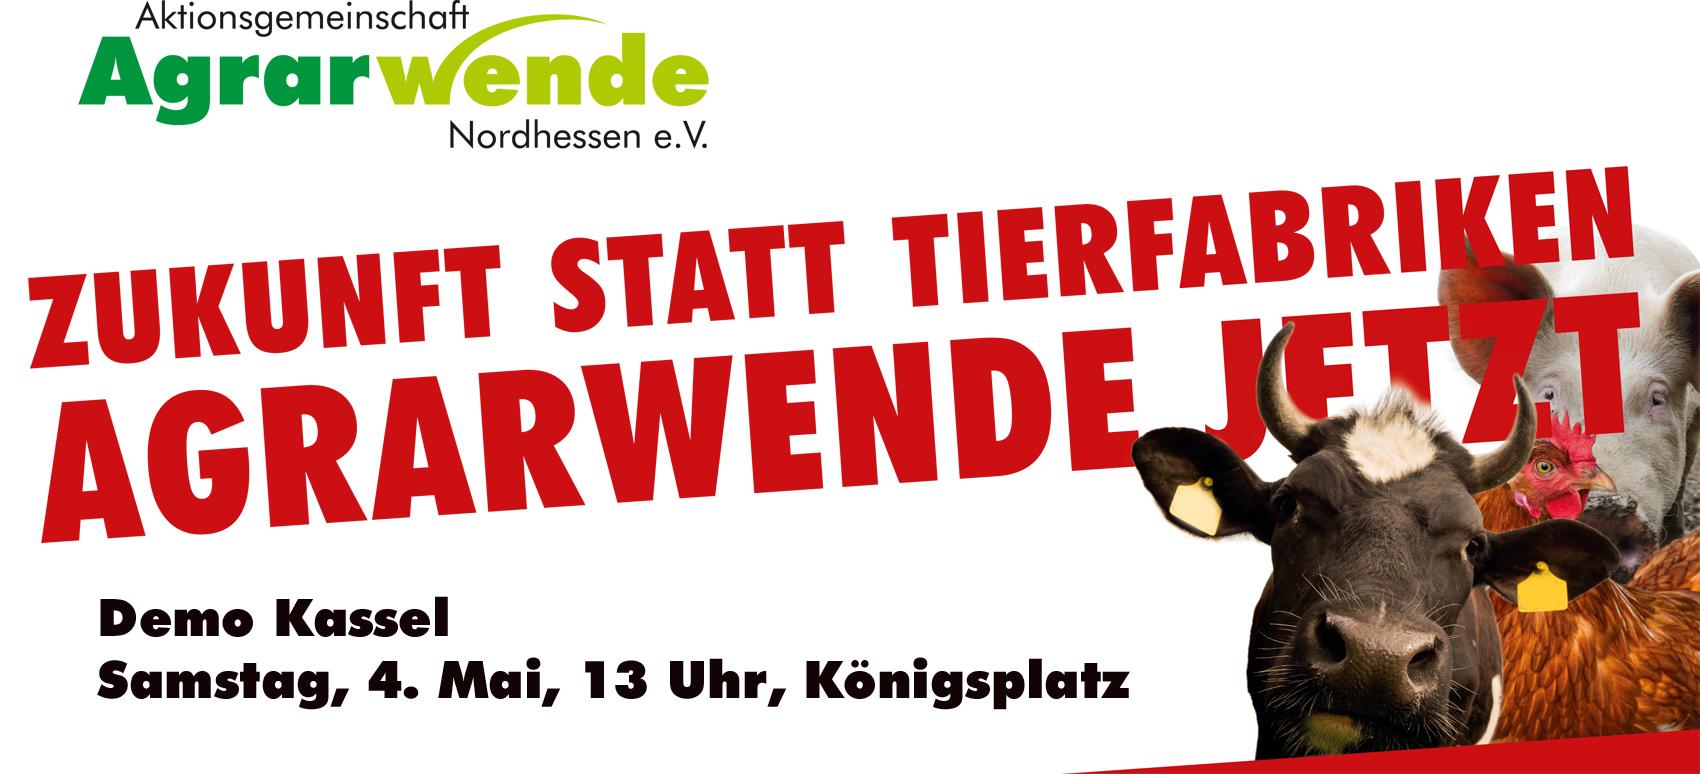 Ankündigung Demo Kassel 4. Mai 2019